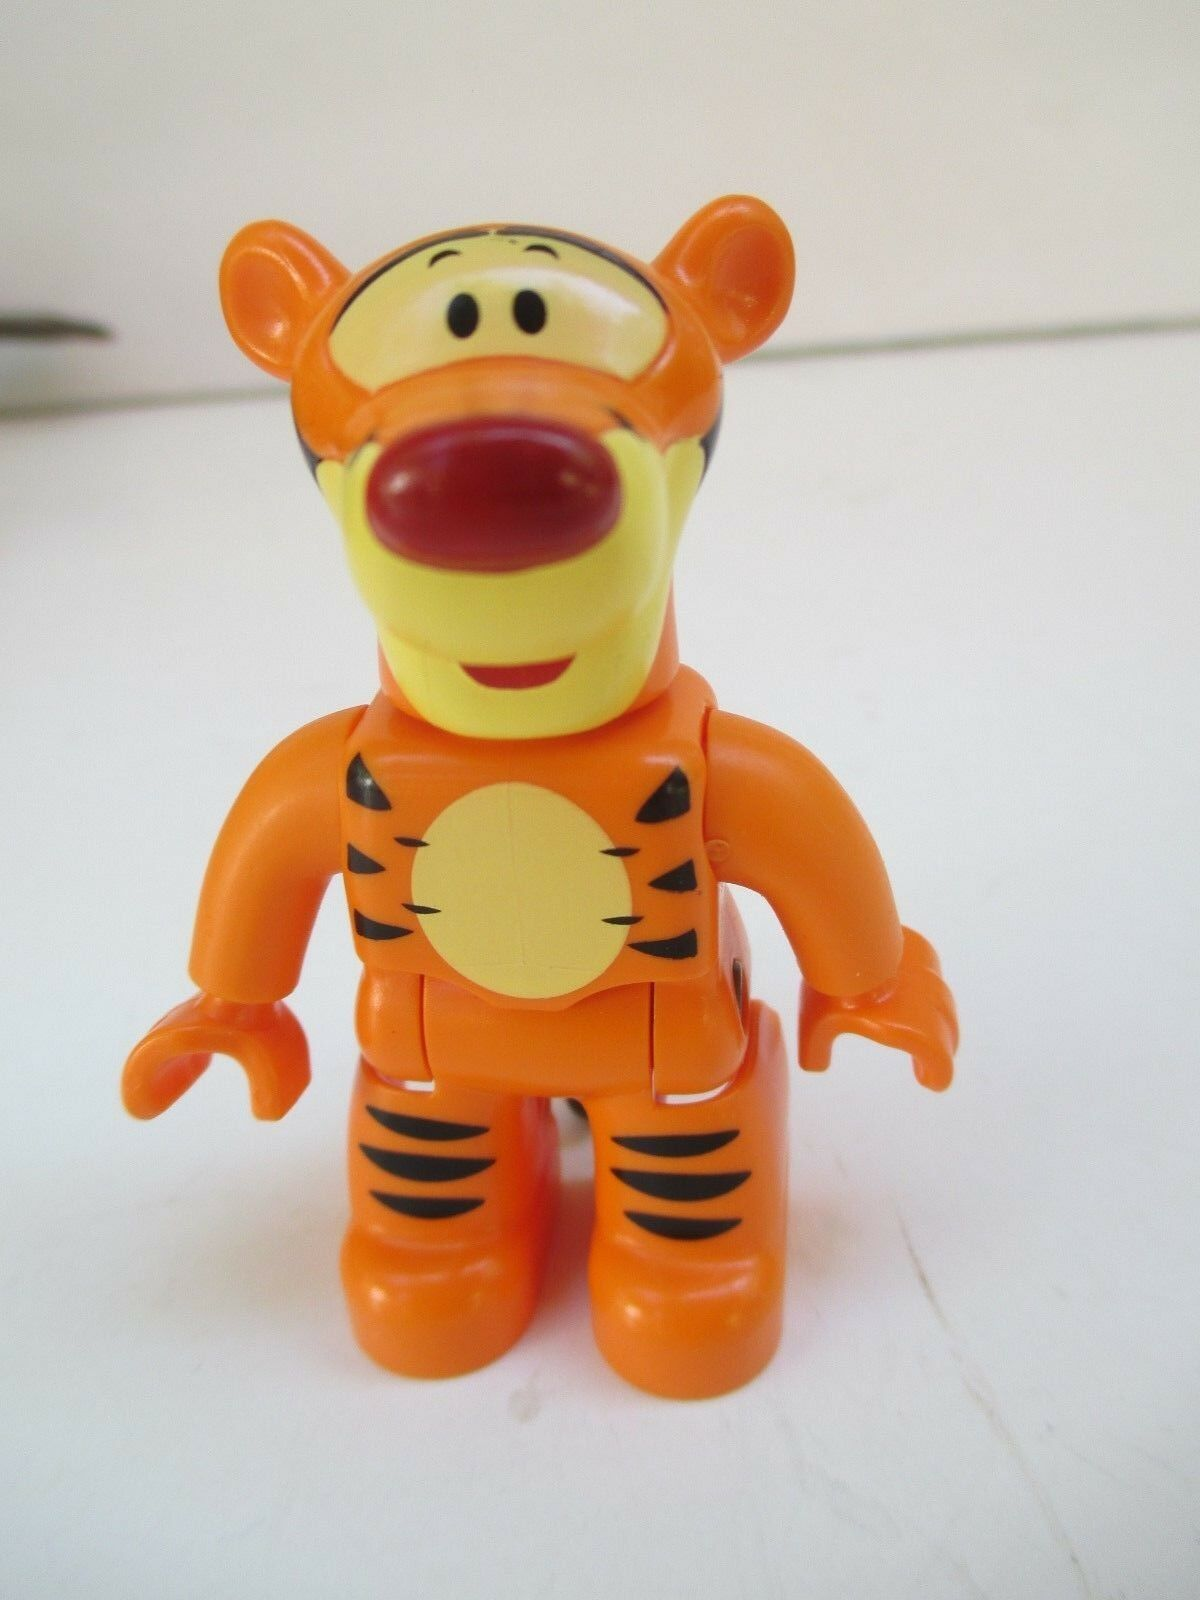 LEGO - Duplo Figure Winnie the Pooh, Tigger (Lego Ville) - VERY RARE 5601